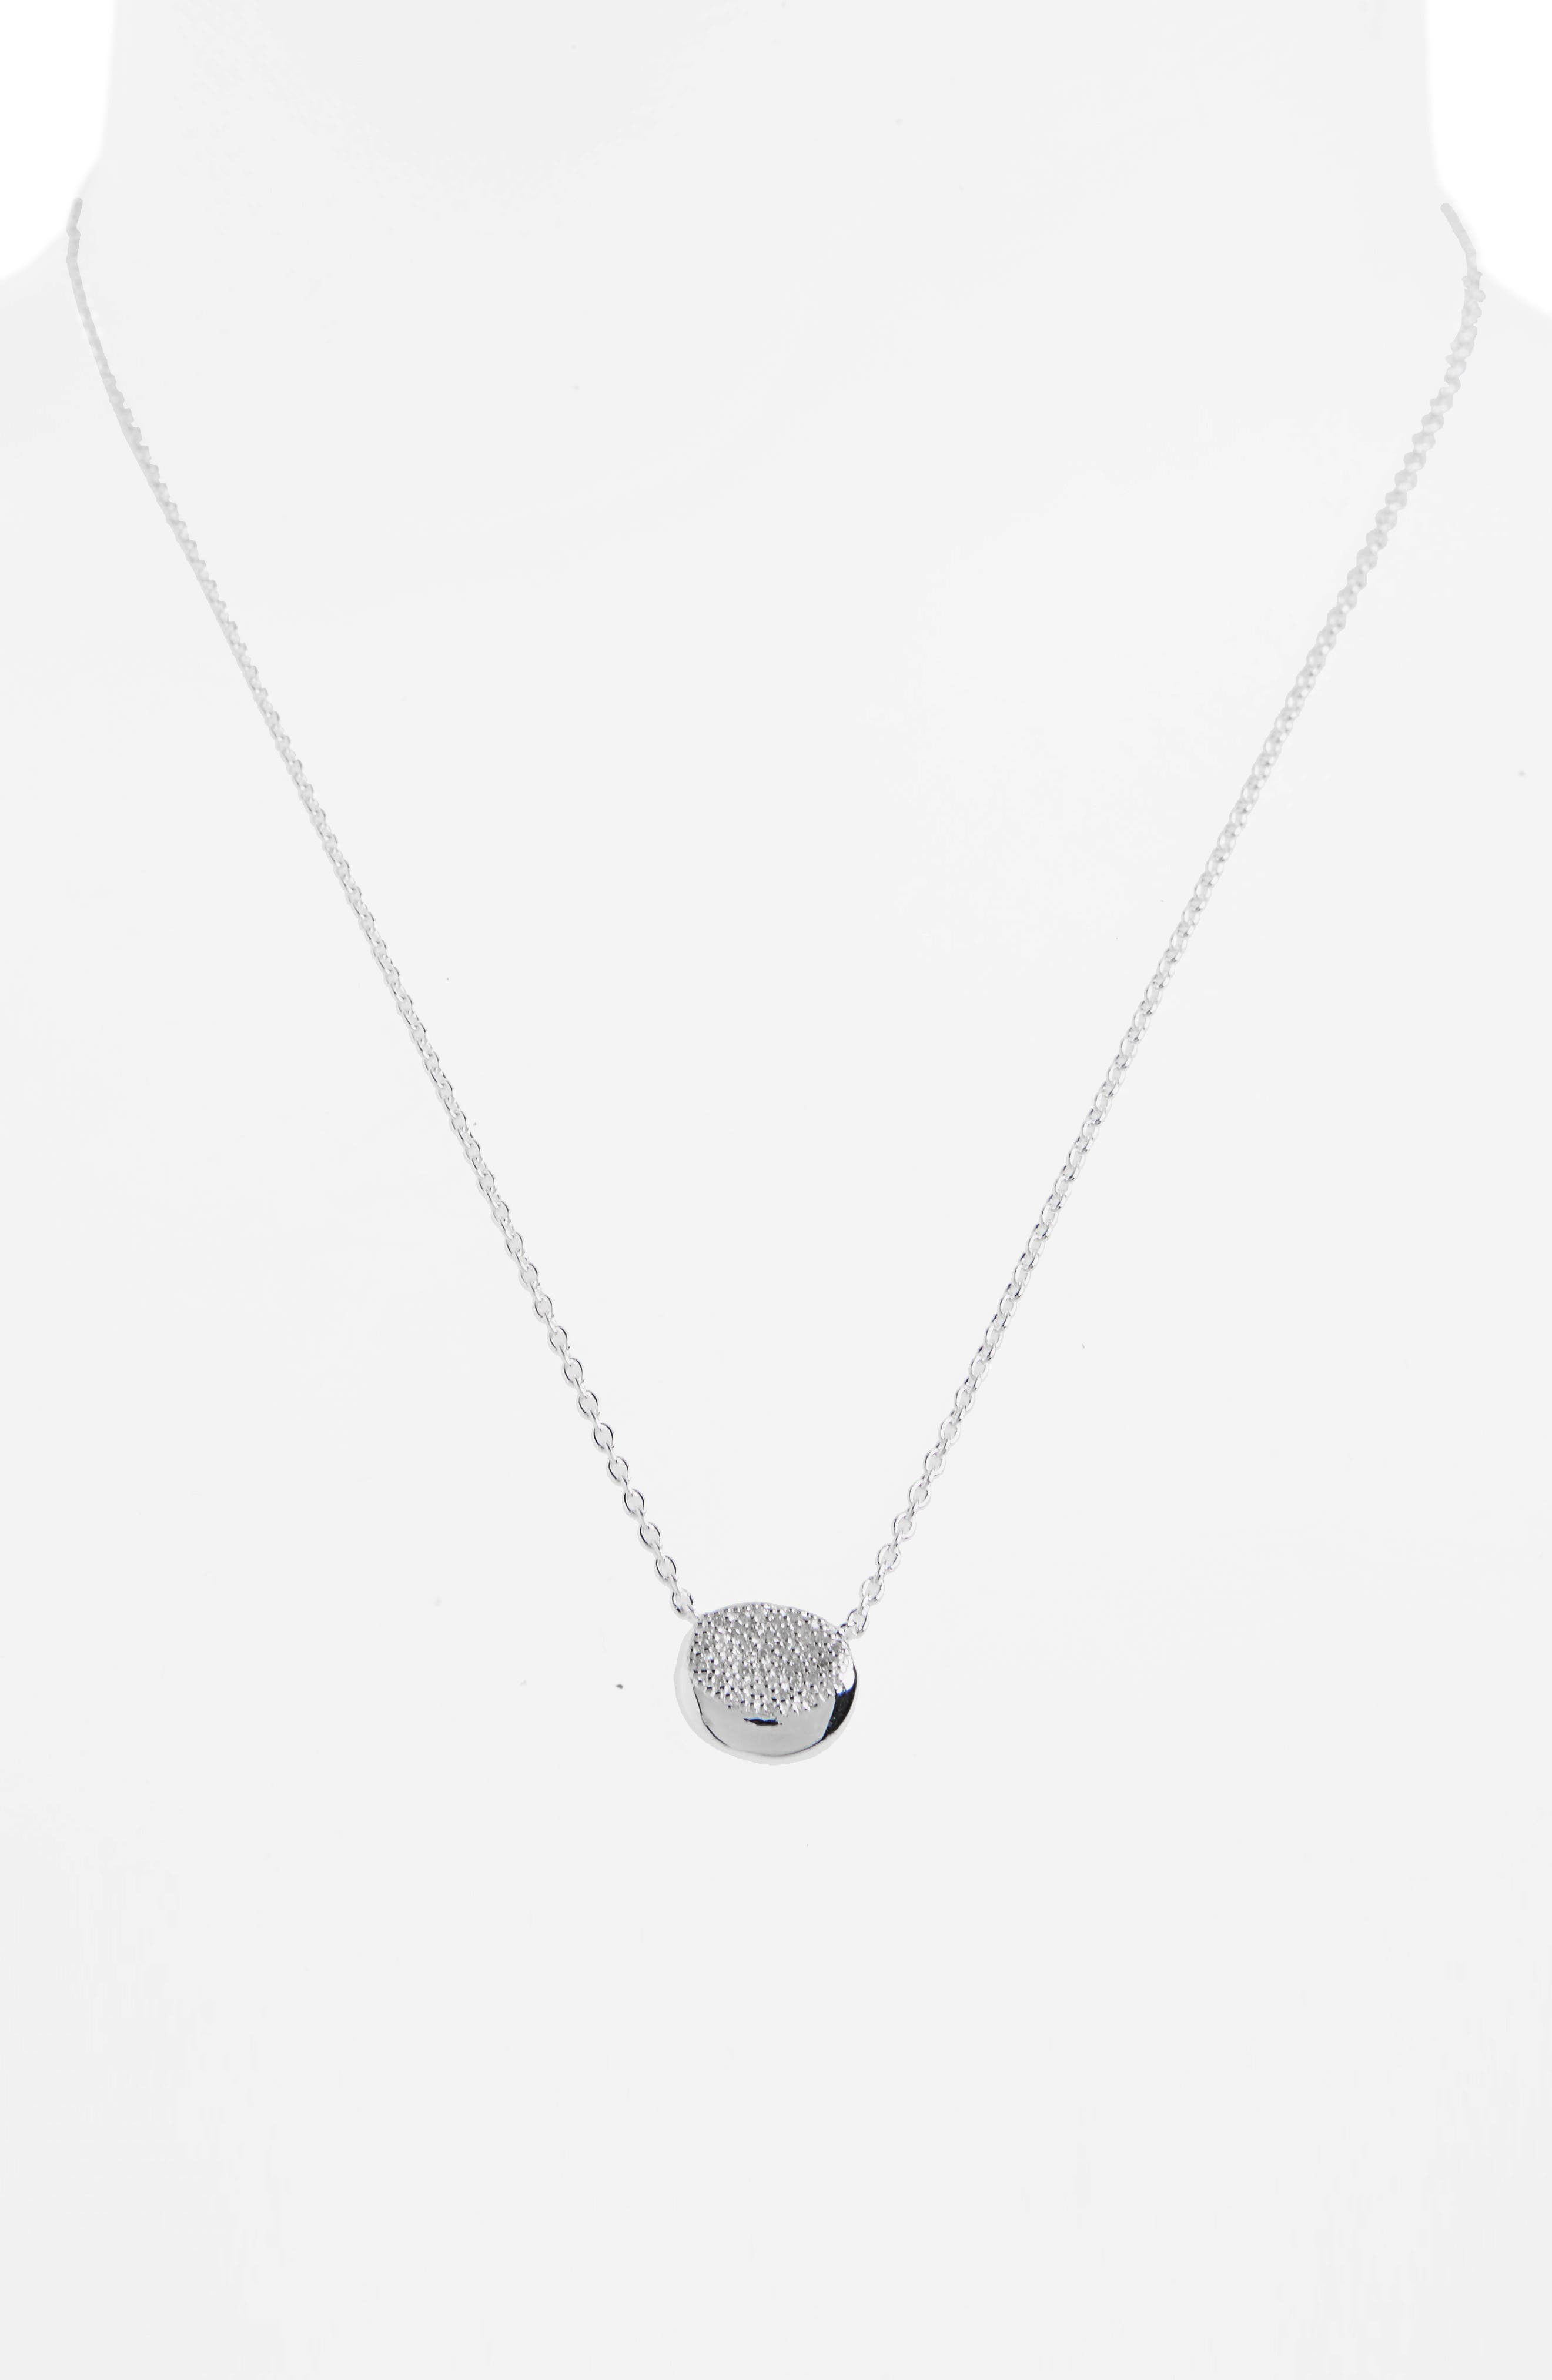 Onda Diamond Pendant Necklace,                             Alternate thumbnail 2, color,                             040